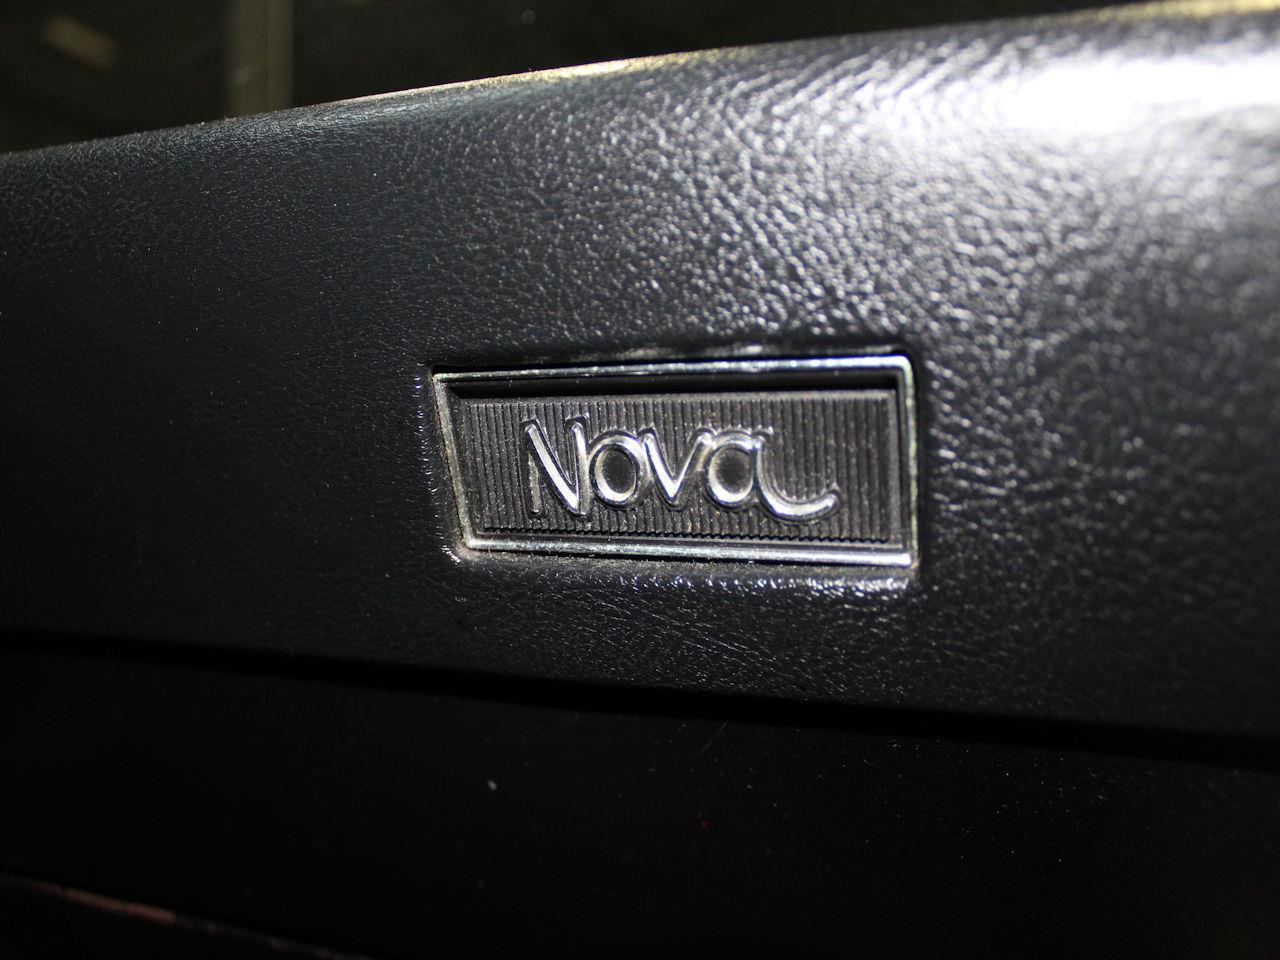 Large Picture of '72 Nova - MB8D